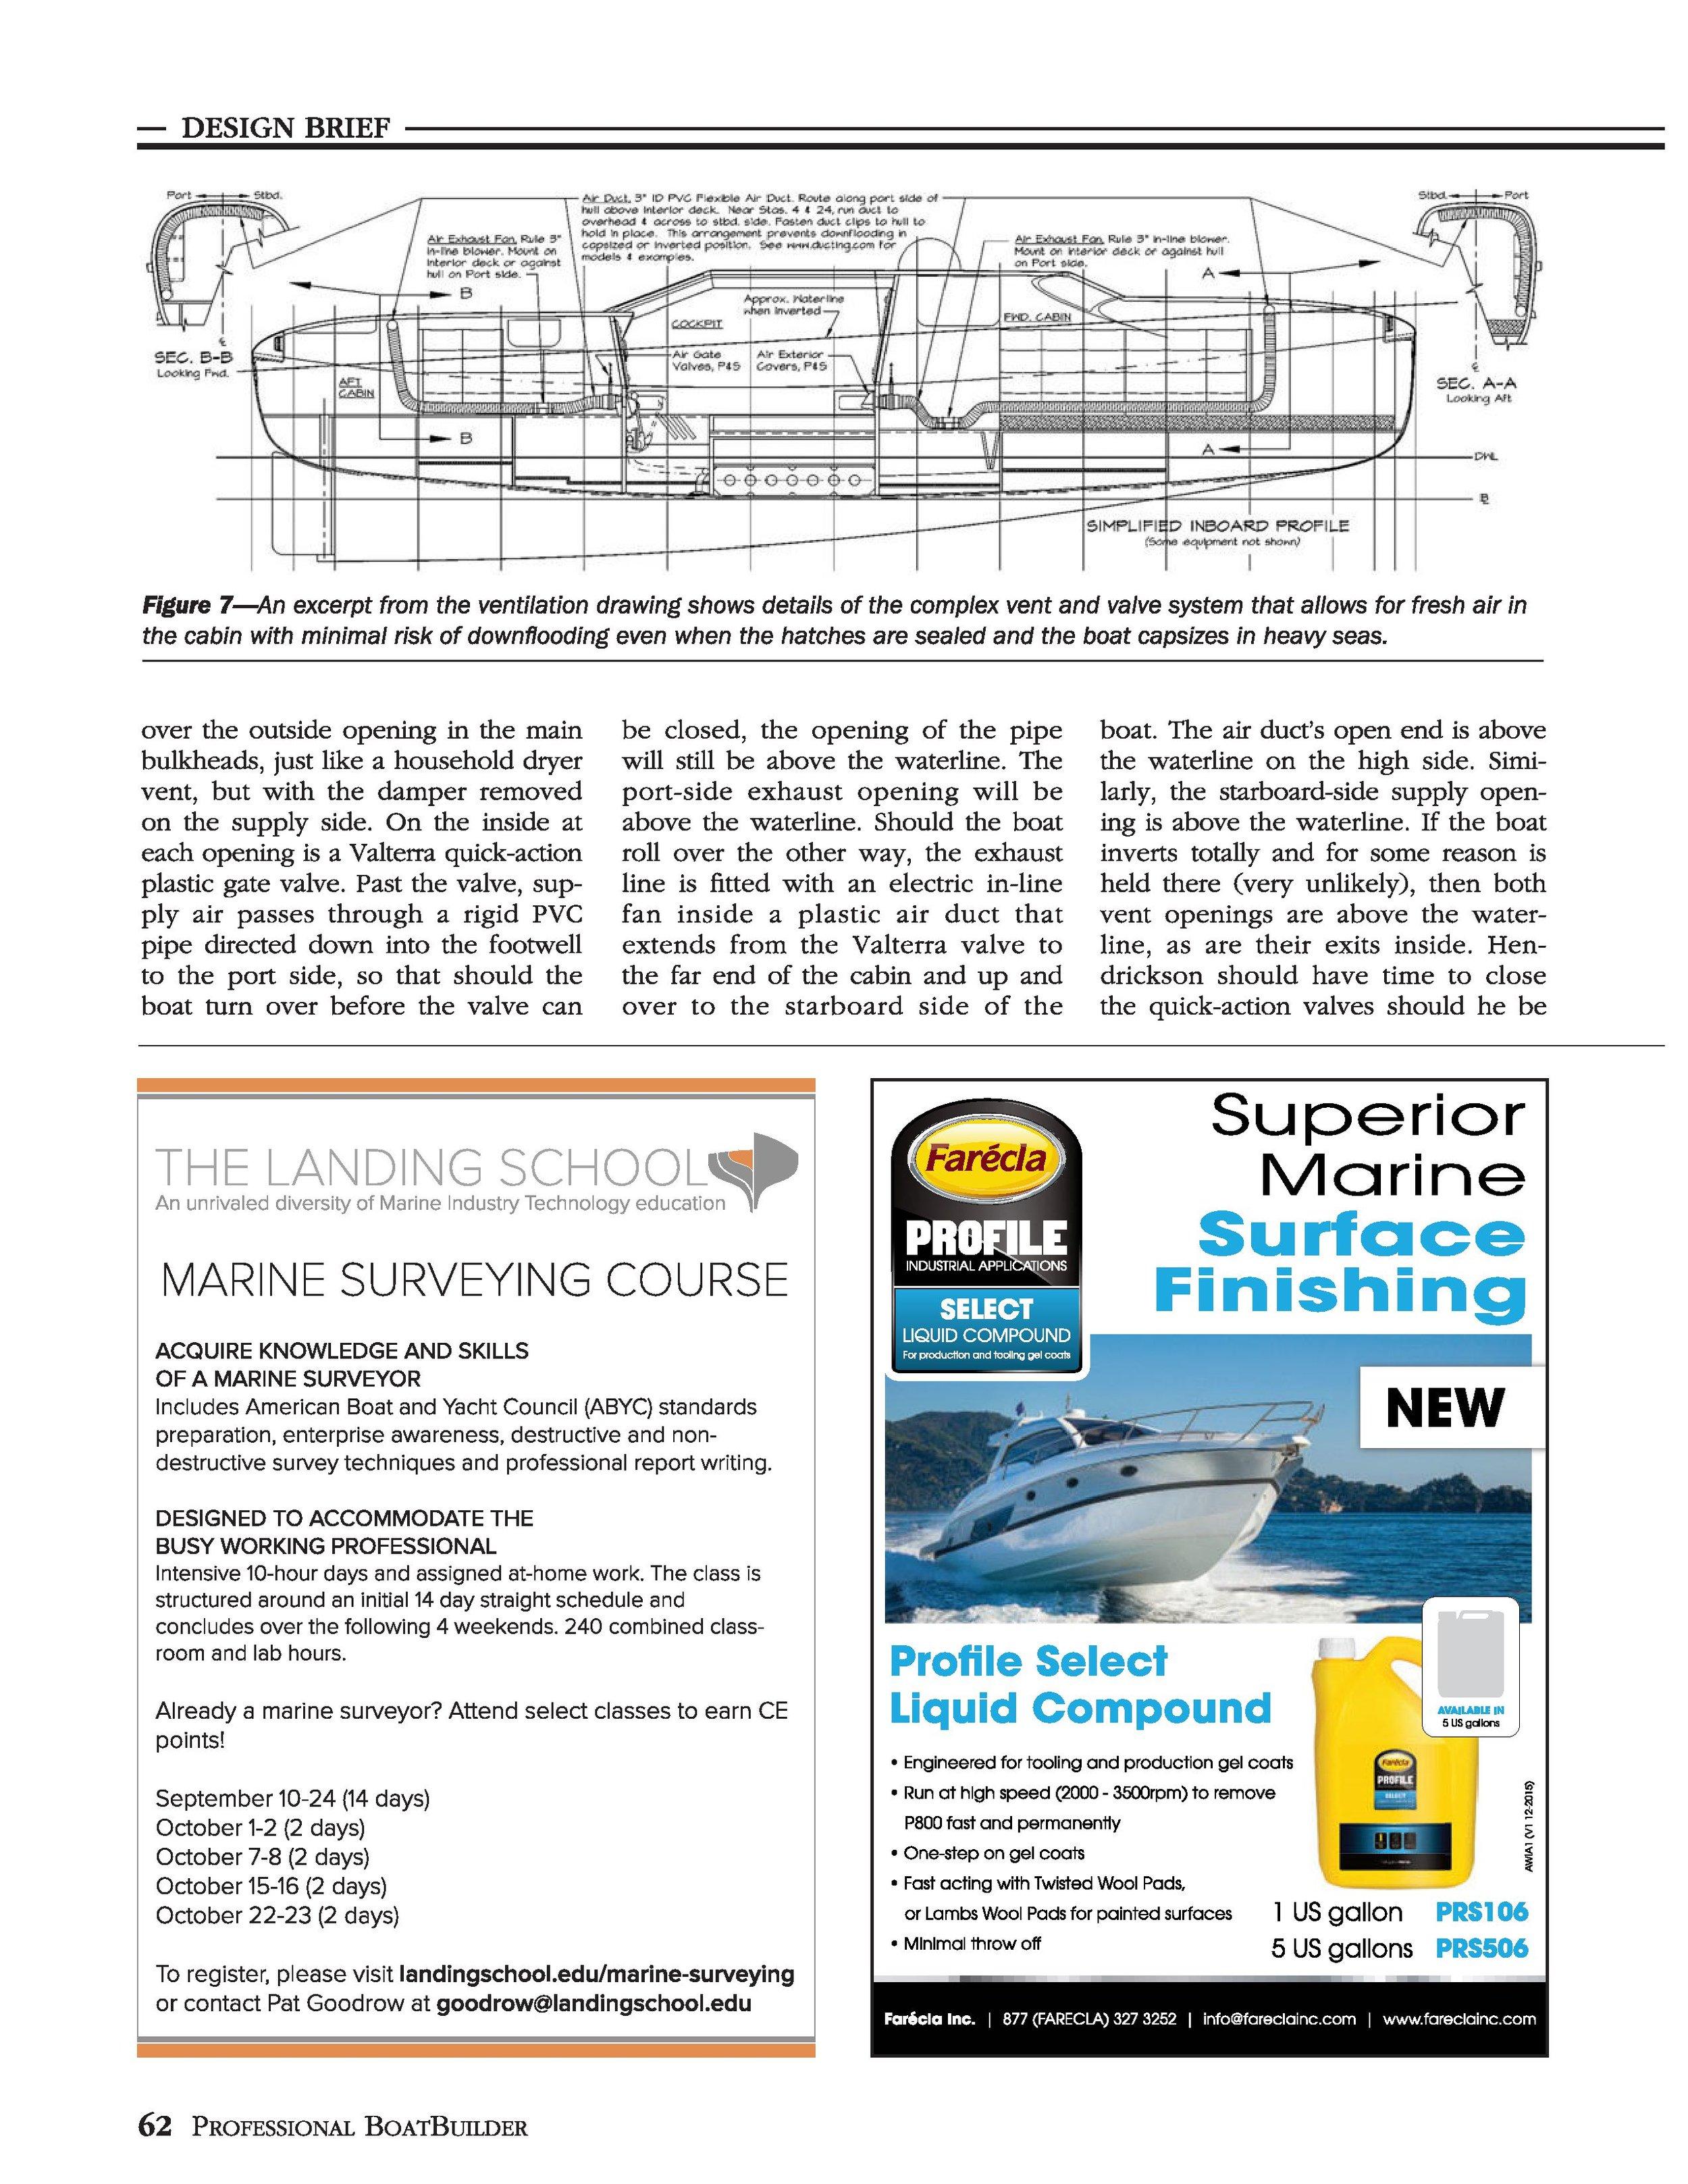 Design Brief Professional Boatbuilder_7.jpg